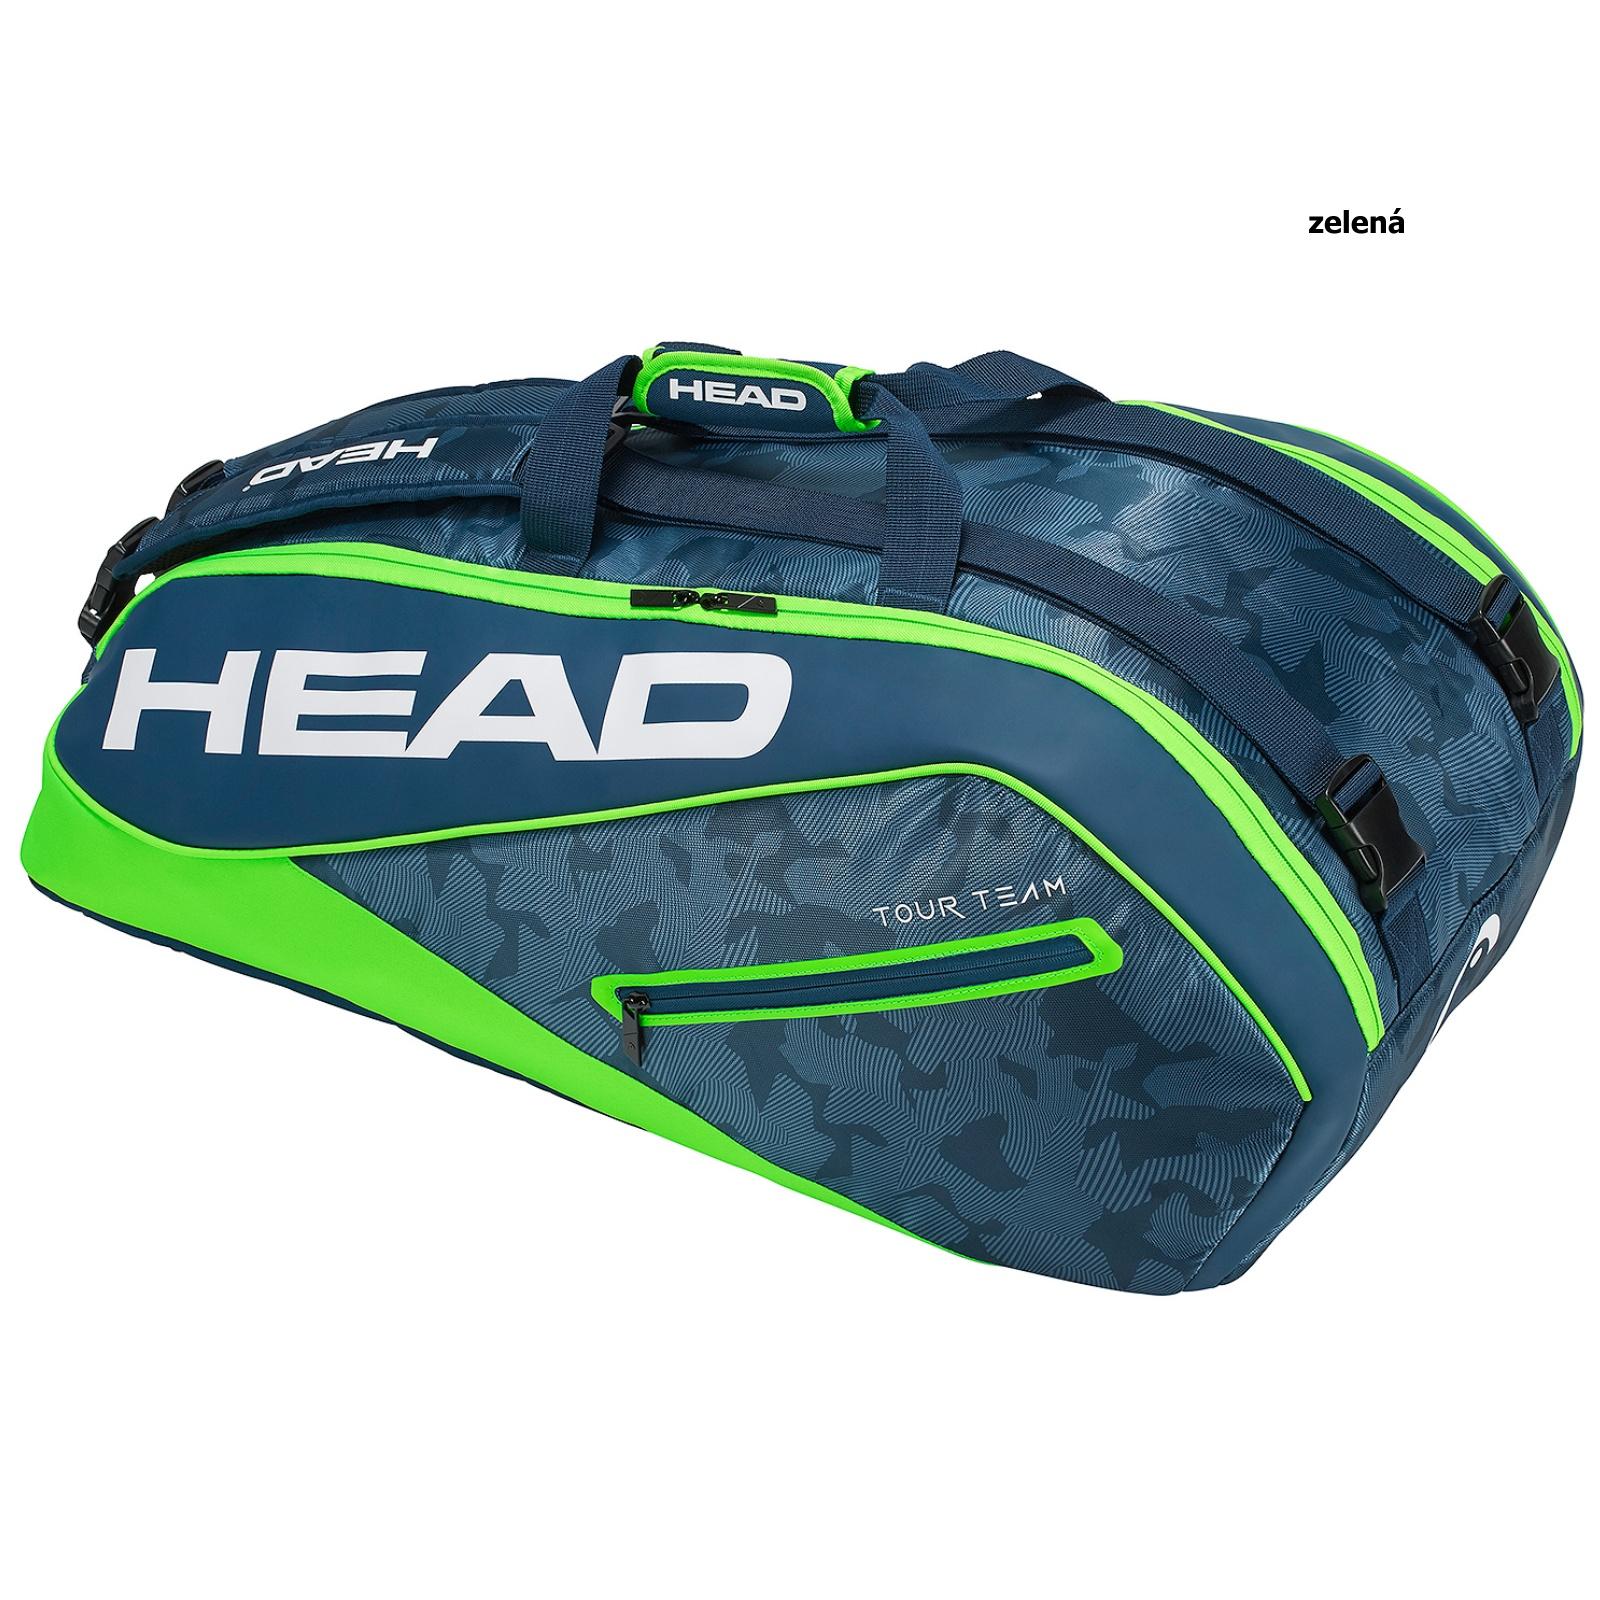 Tenisová taška HEAD Tour 9R Supercombi - zelená